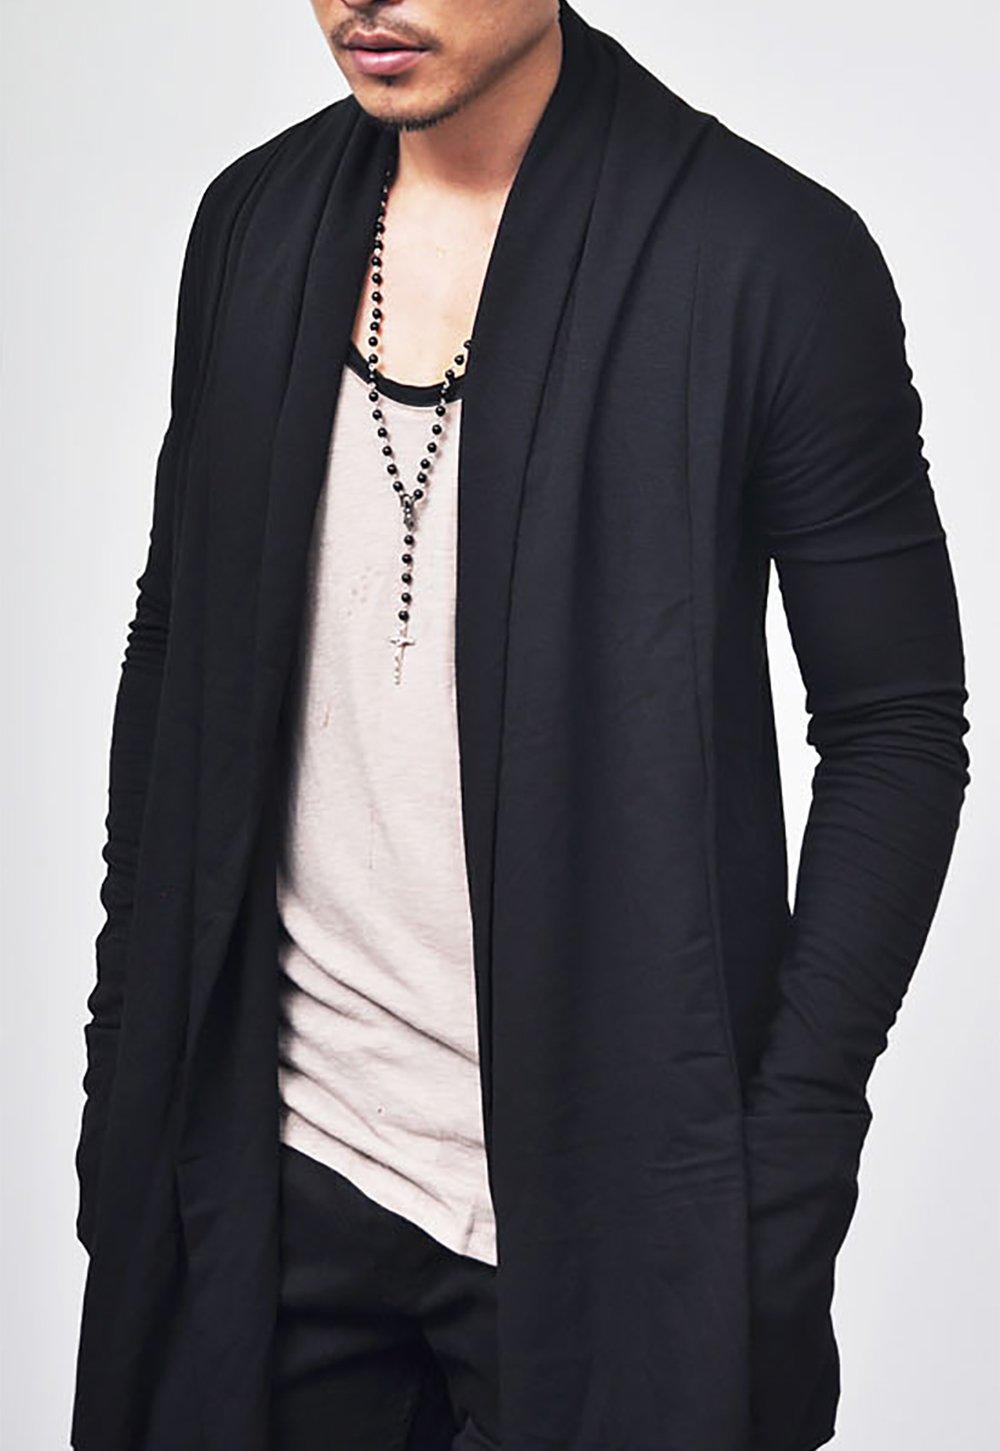 COOFANDY Men's Ruffle Shawl Collar Long Sleeves Cardigan (Medium, Black) by COOFANDY (Image #3)